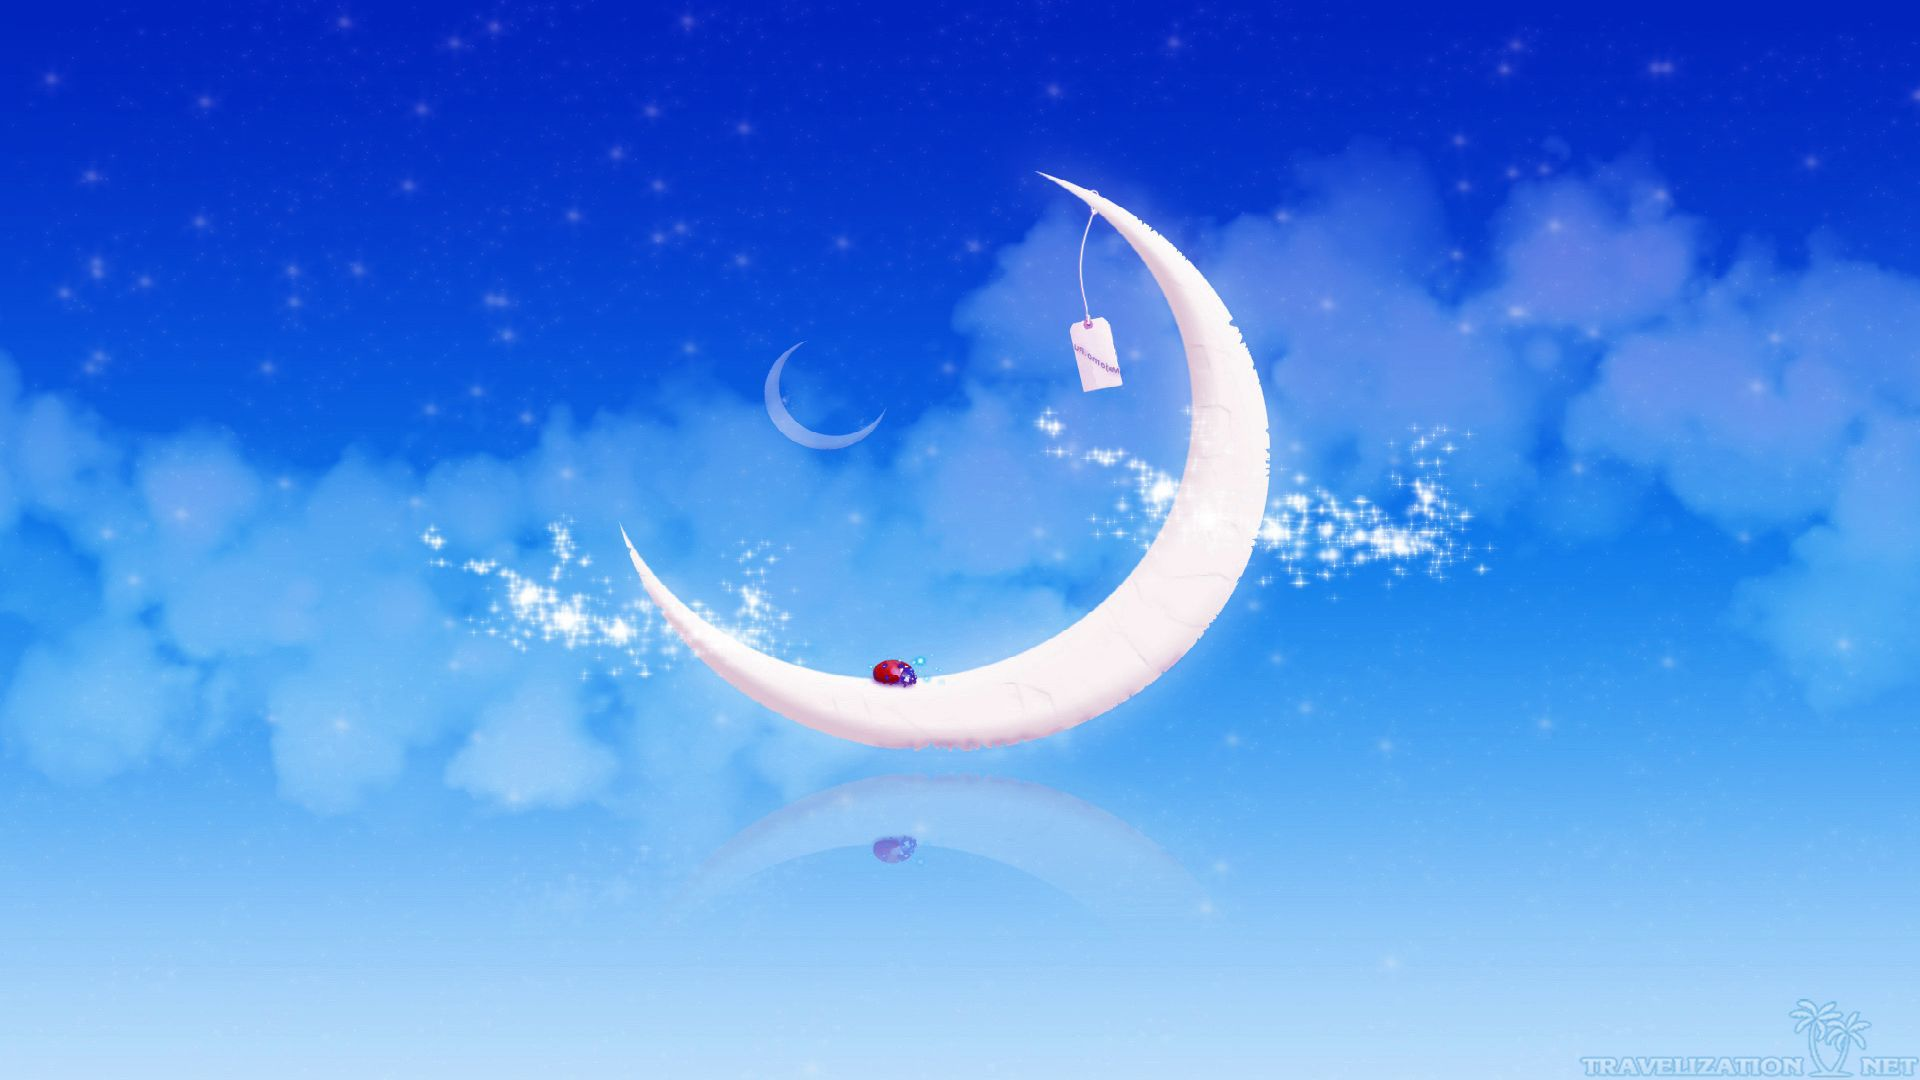 Hd wallpaper moon - Crescent Moon Wallpaper 3678 Hd Wallpapers In Space Imagesci Com